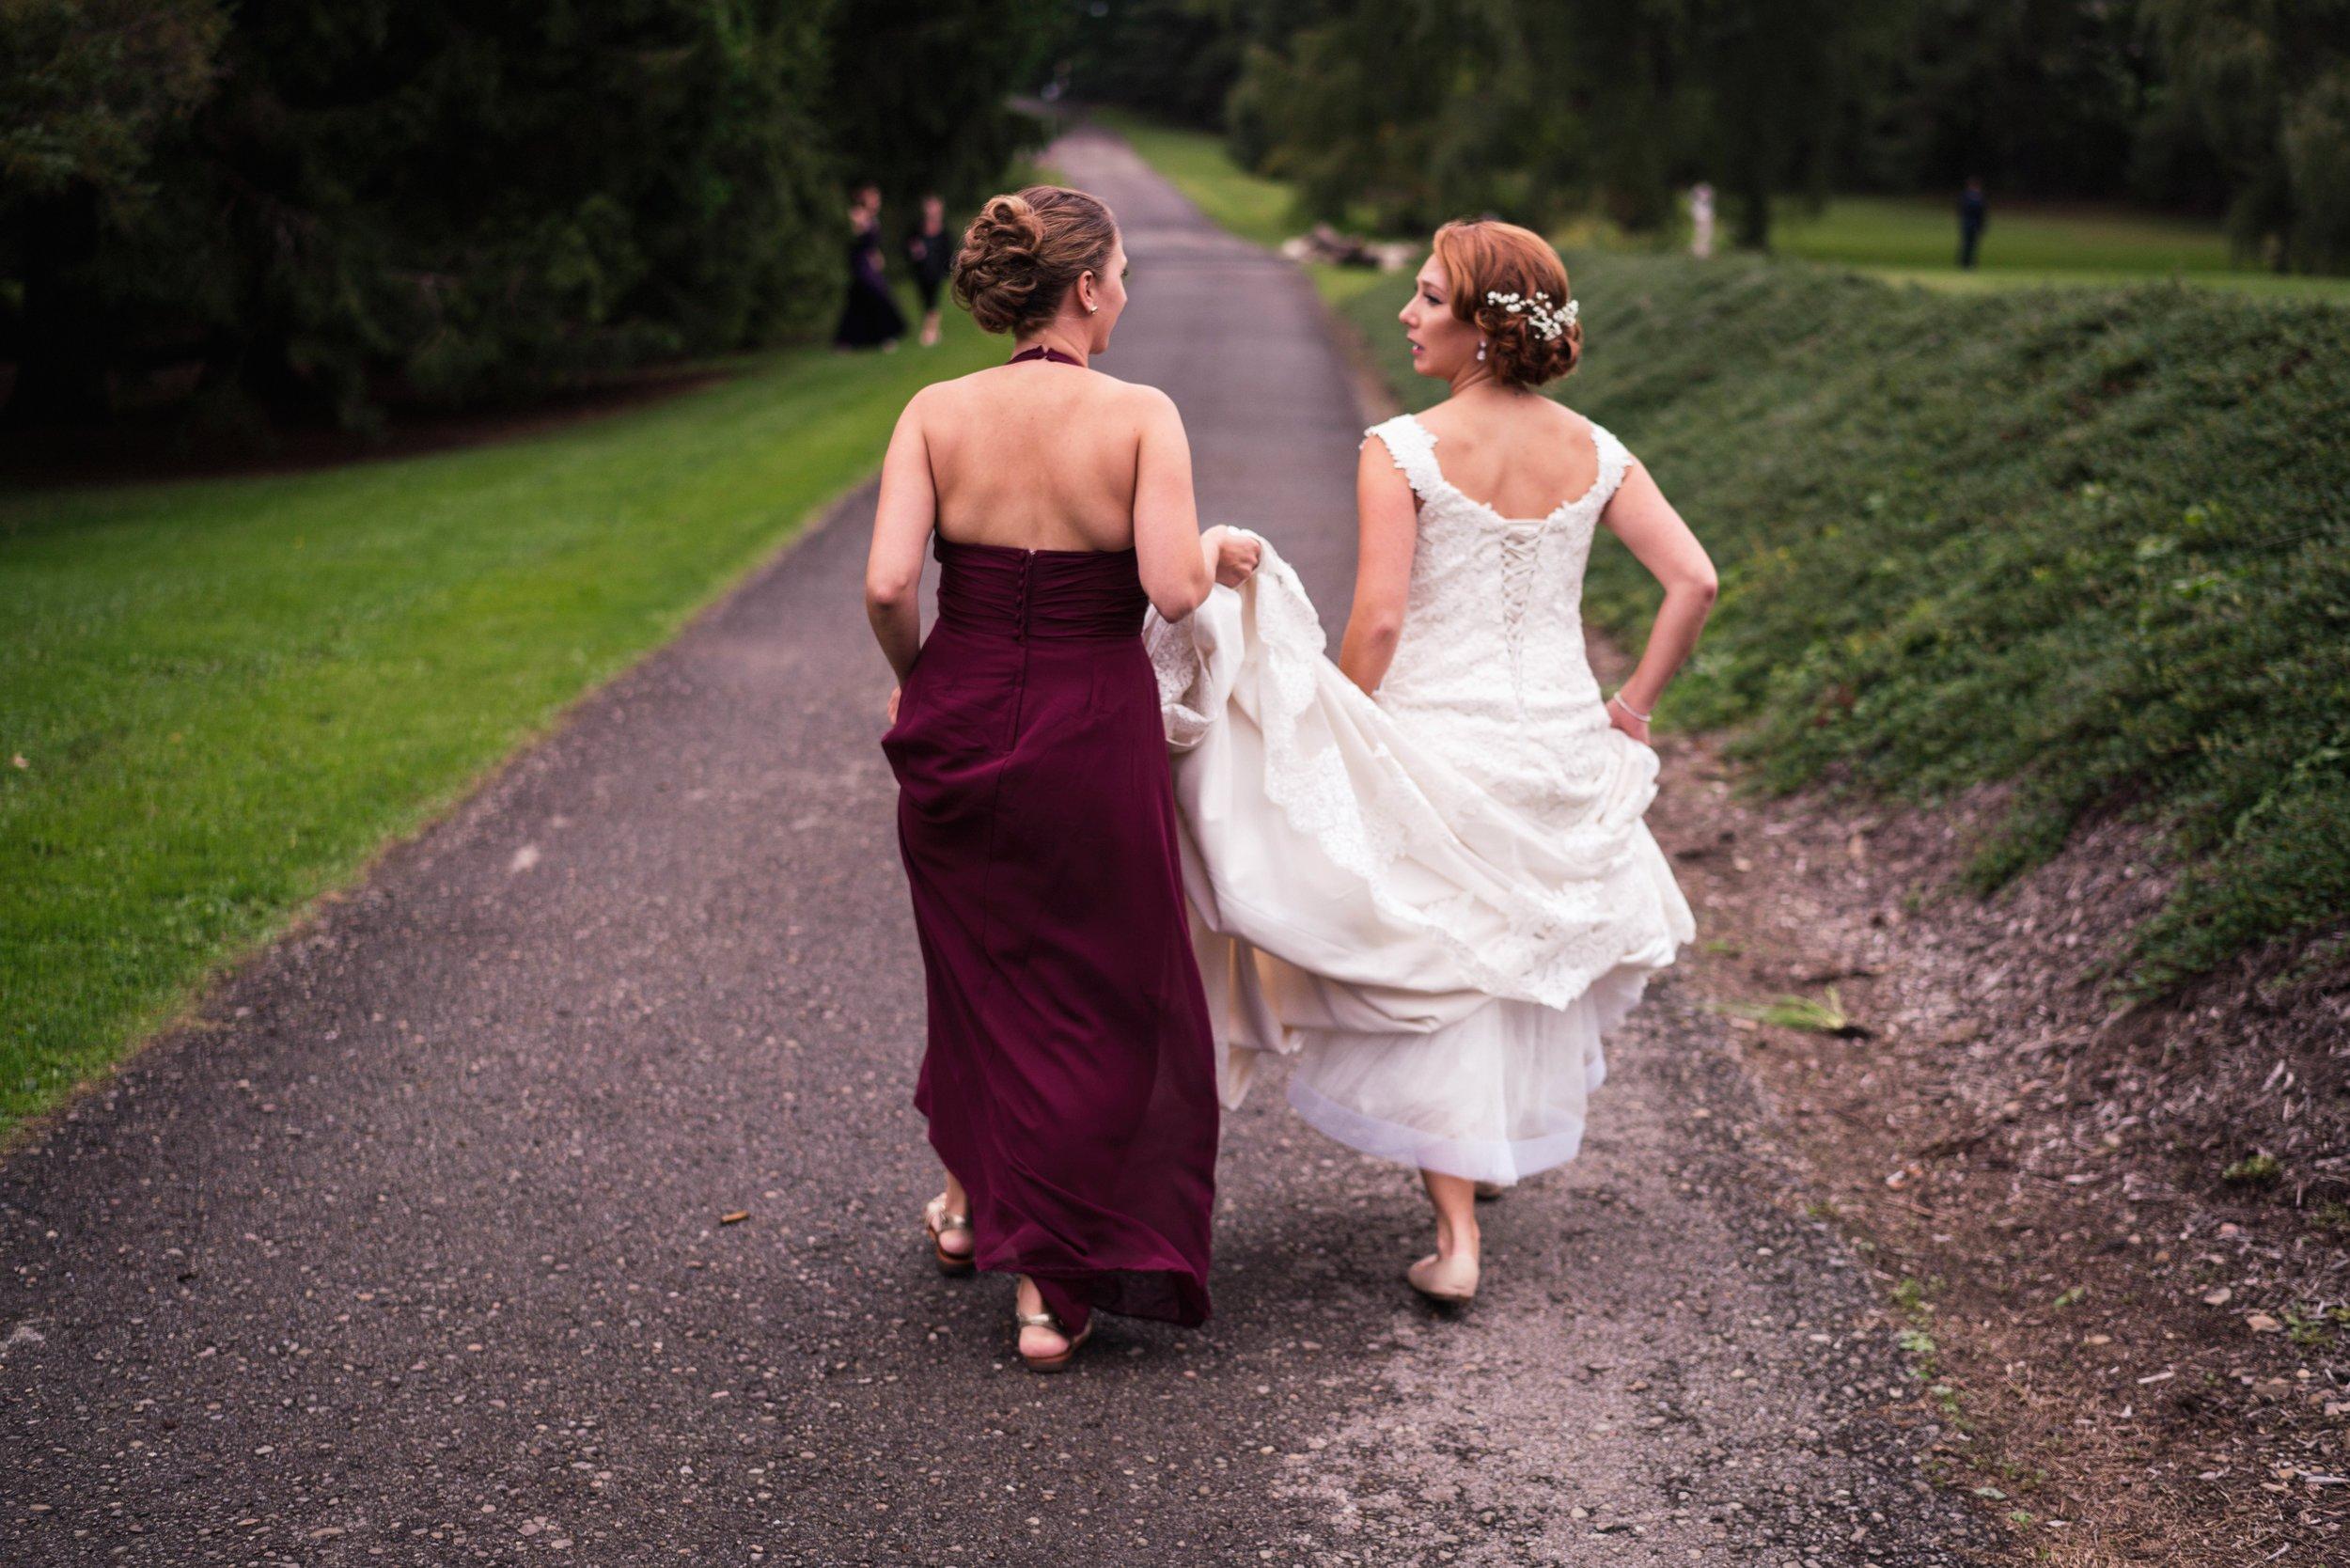 Blog-Lisa-James-Wedding-at Rosebud Estate Weddings in Arcade NY by Stefan-Ludwig-Photography-Buffalo-NY-14-x.jpg